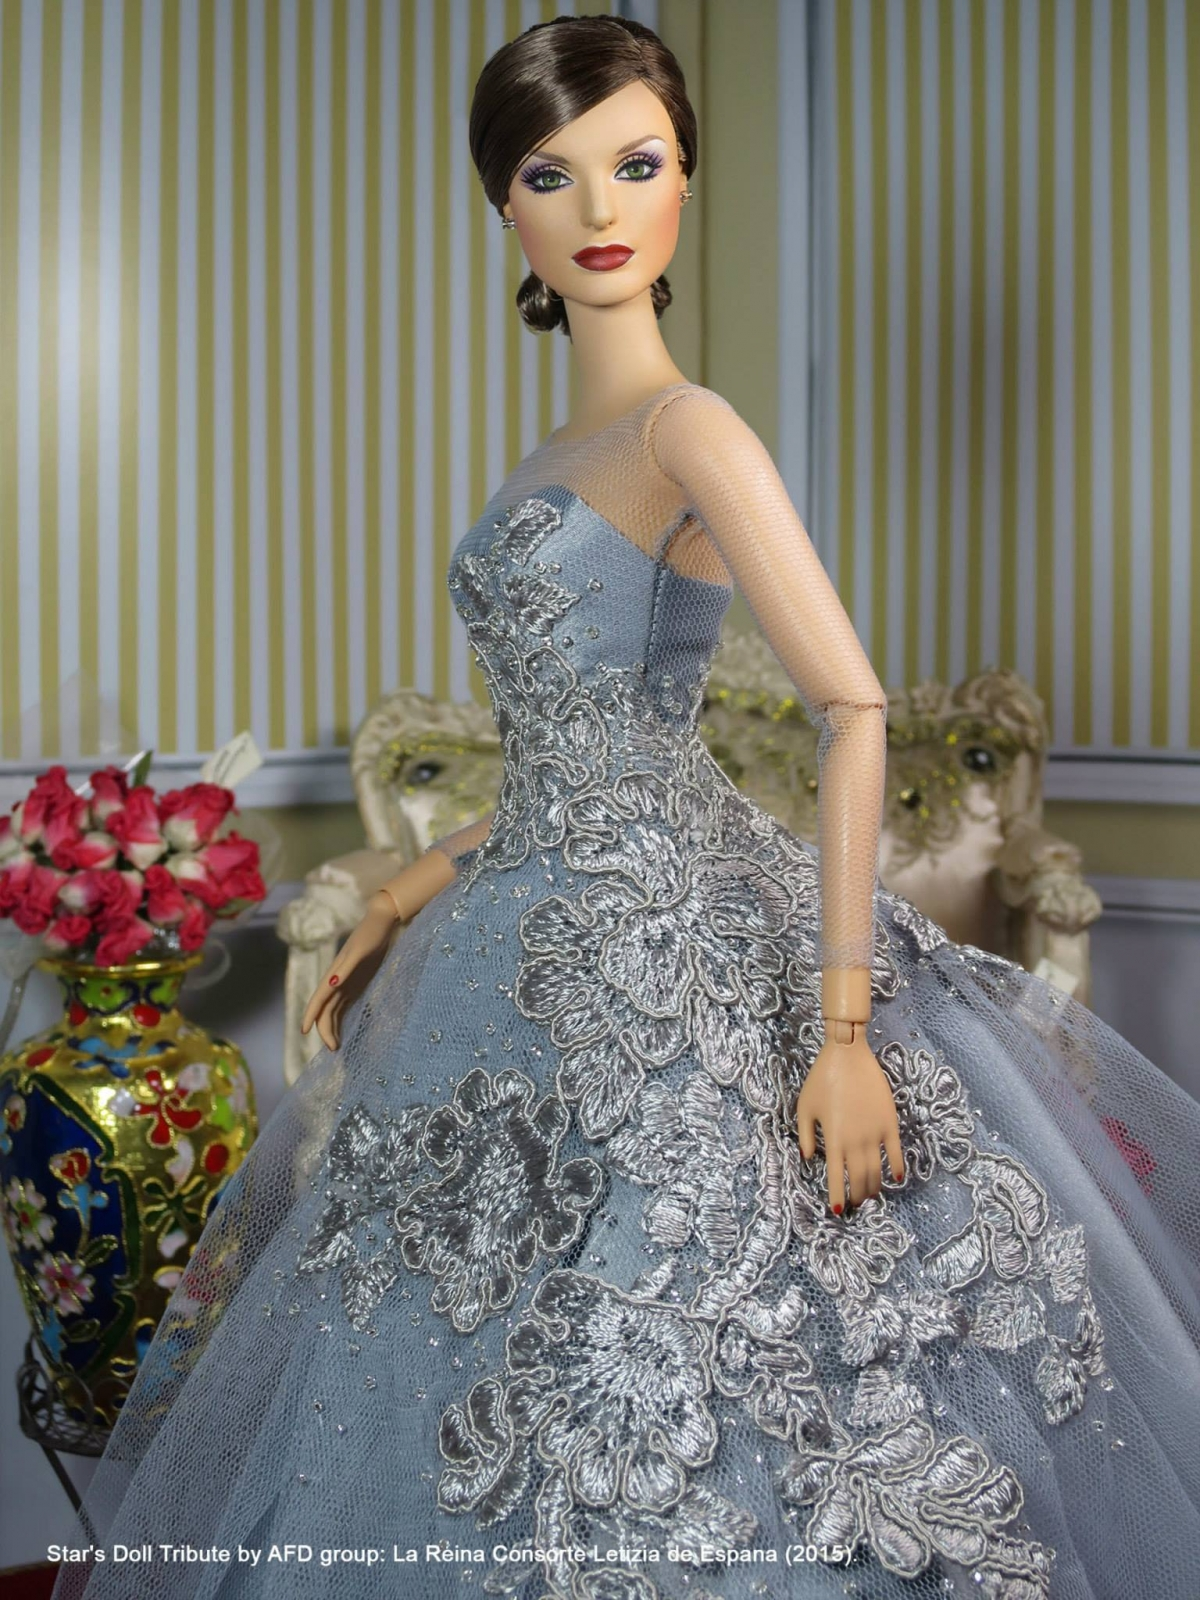 Queen Letizia doll